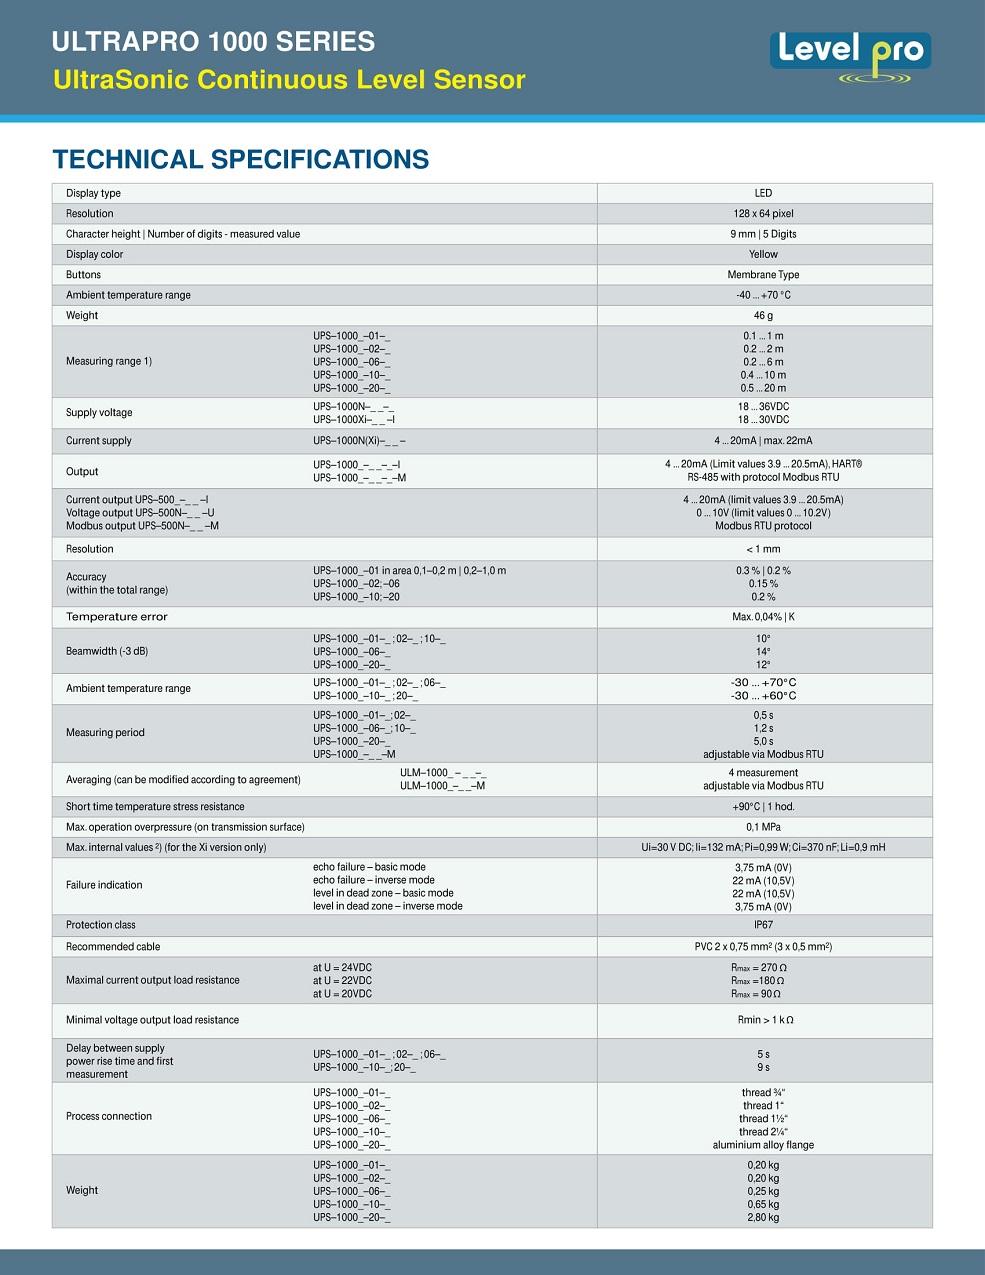 UPS-1000 Ultrasonic Level Sensor